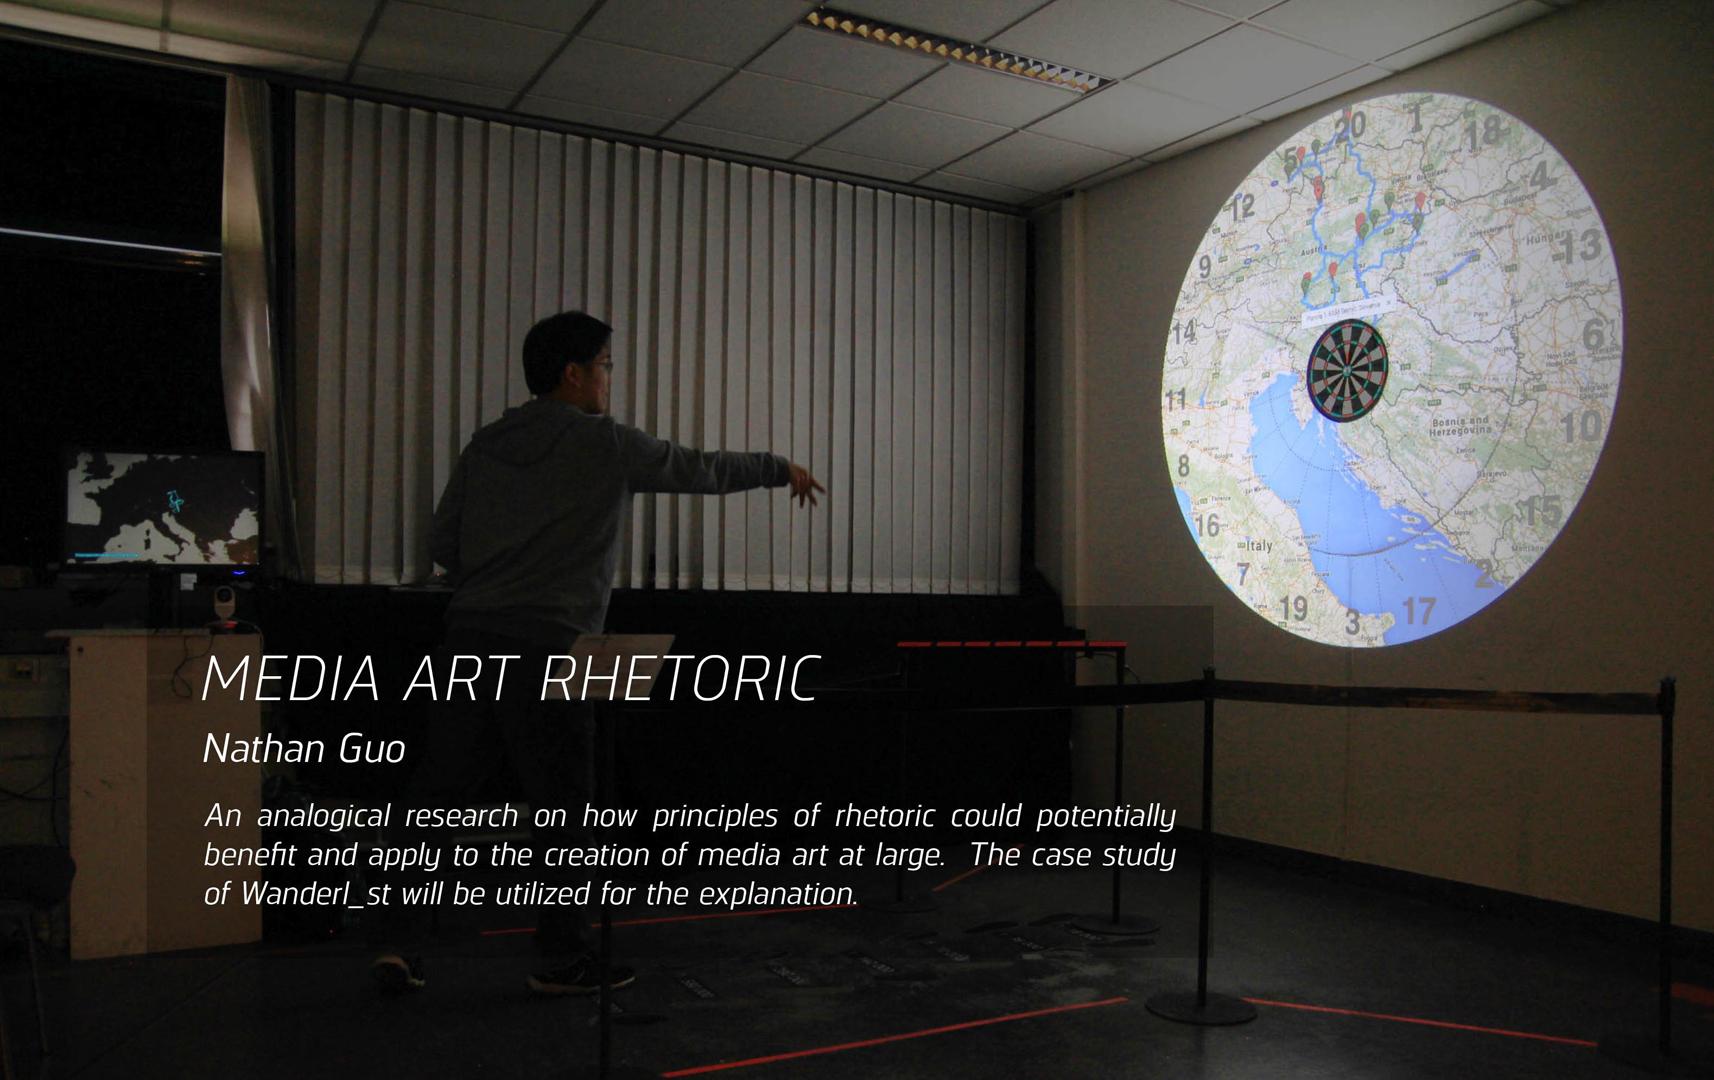 ©ISEA2016: 22nd International Symposium on Electronic Art, Nathan Guo, Media Art Rhetoric: A Case Study of Wanderl_st